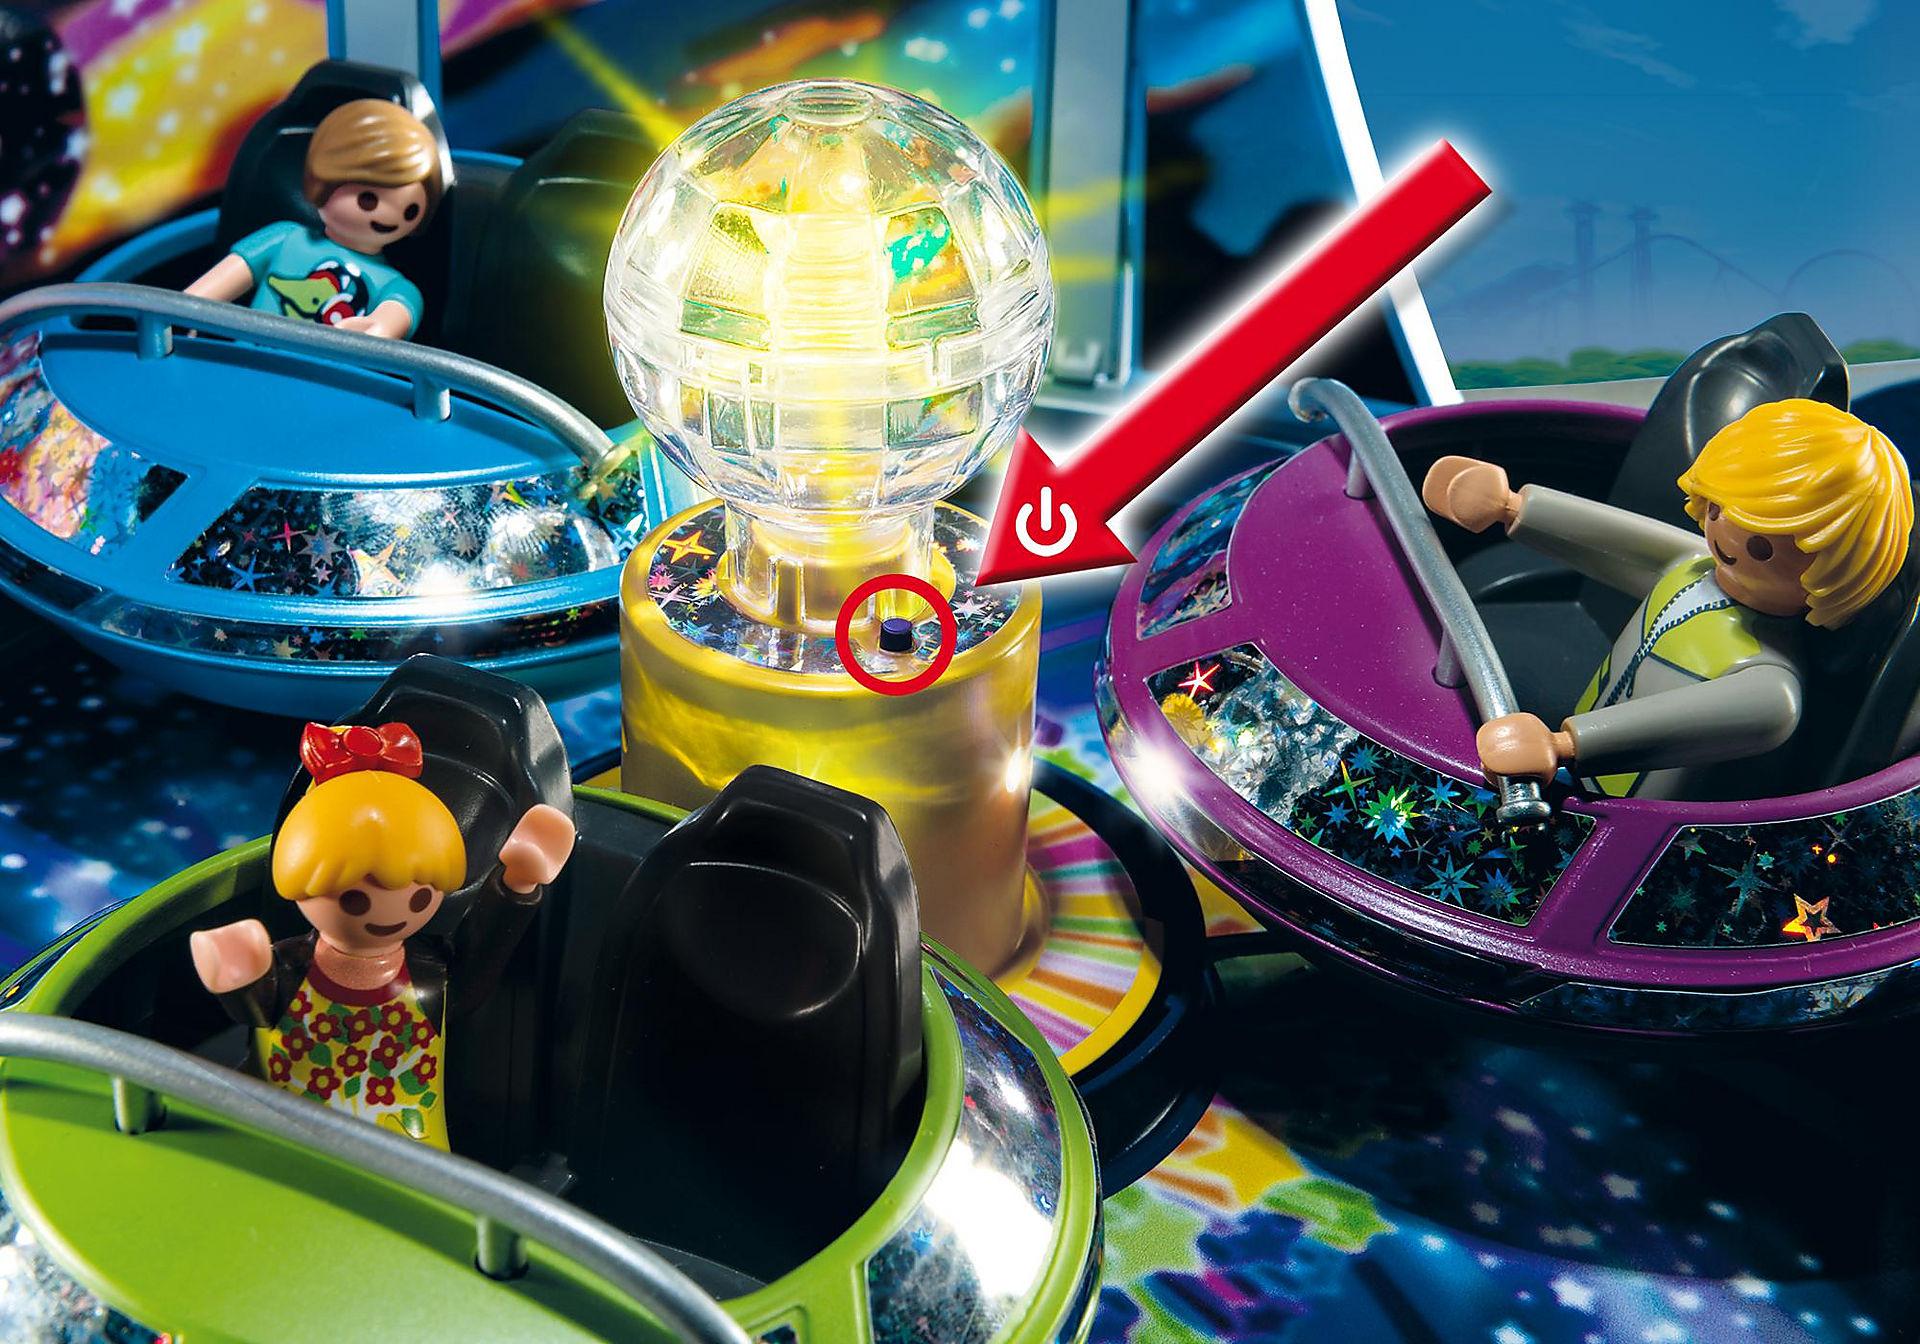 http://media.playmobil.com/i/playmobil/5554_product_extra2/Ottovolante con effetti luminosi